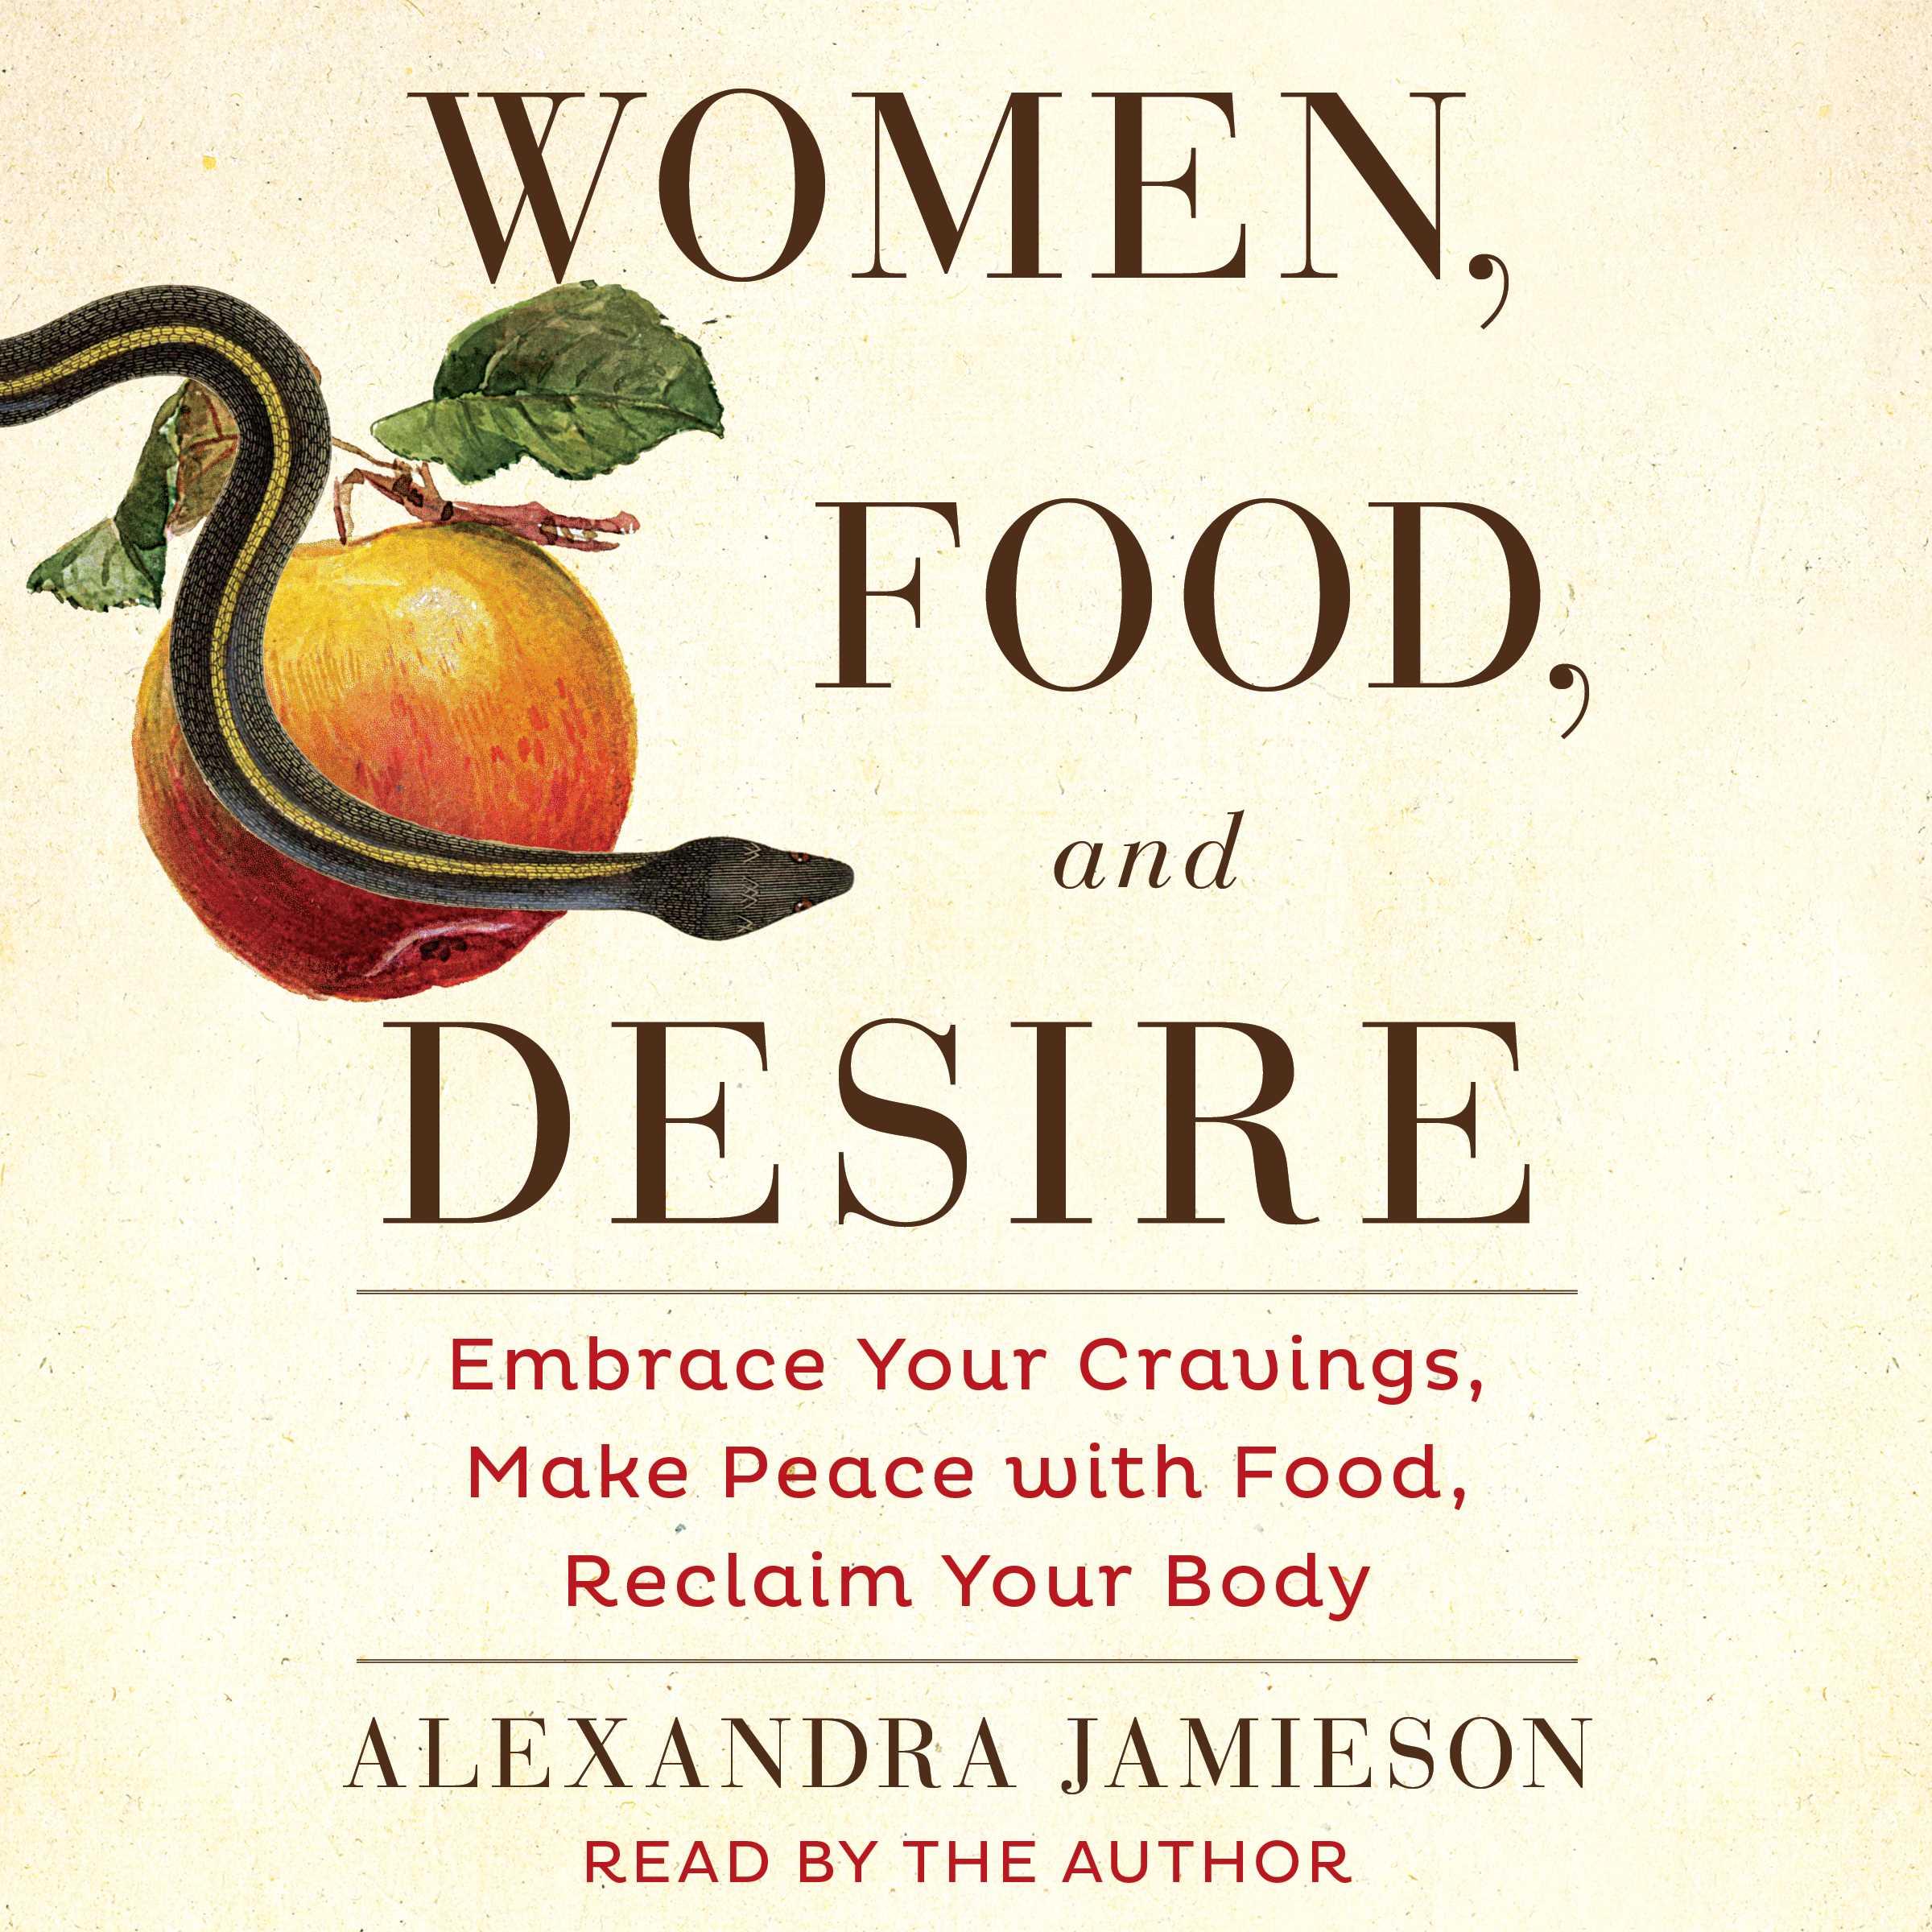 Women food and desire 9781442377561 hr